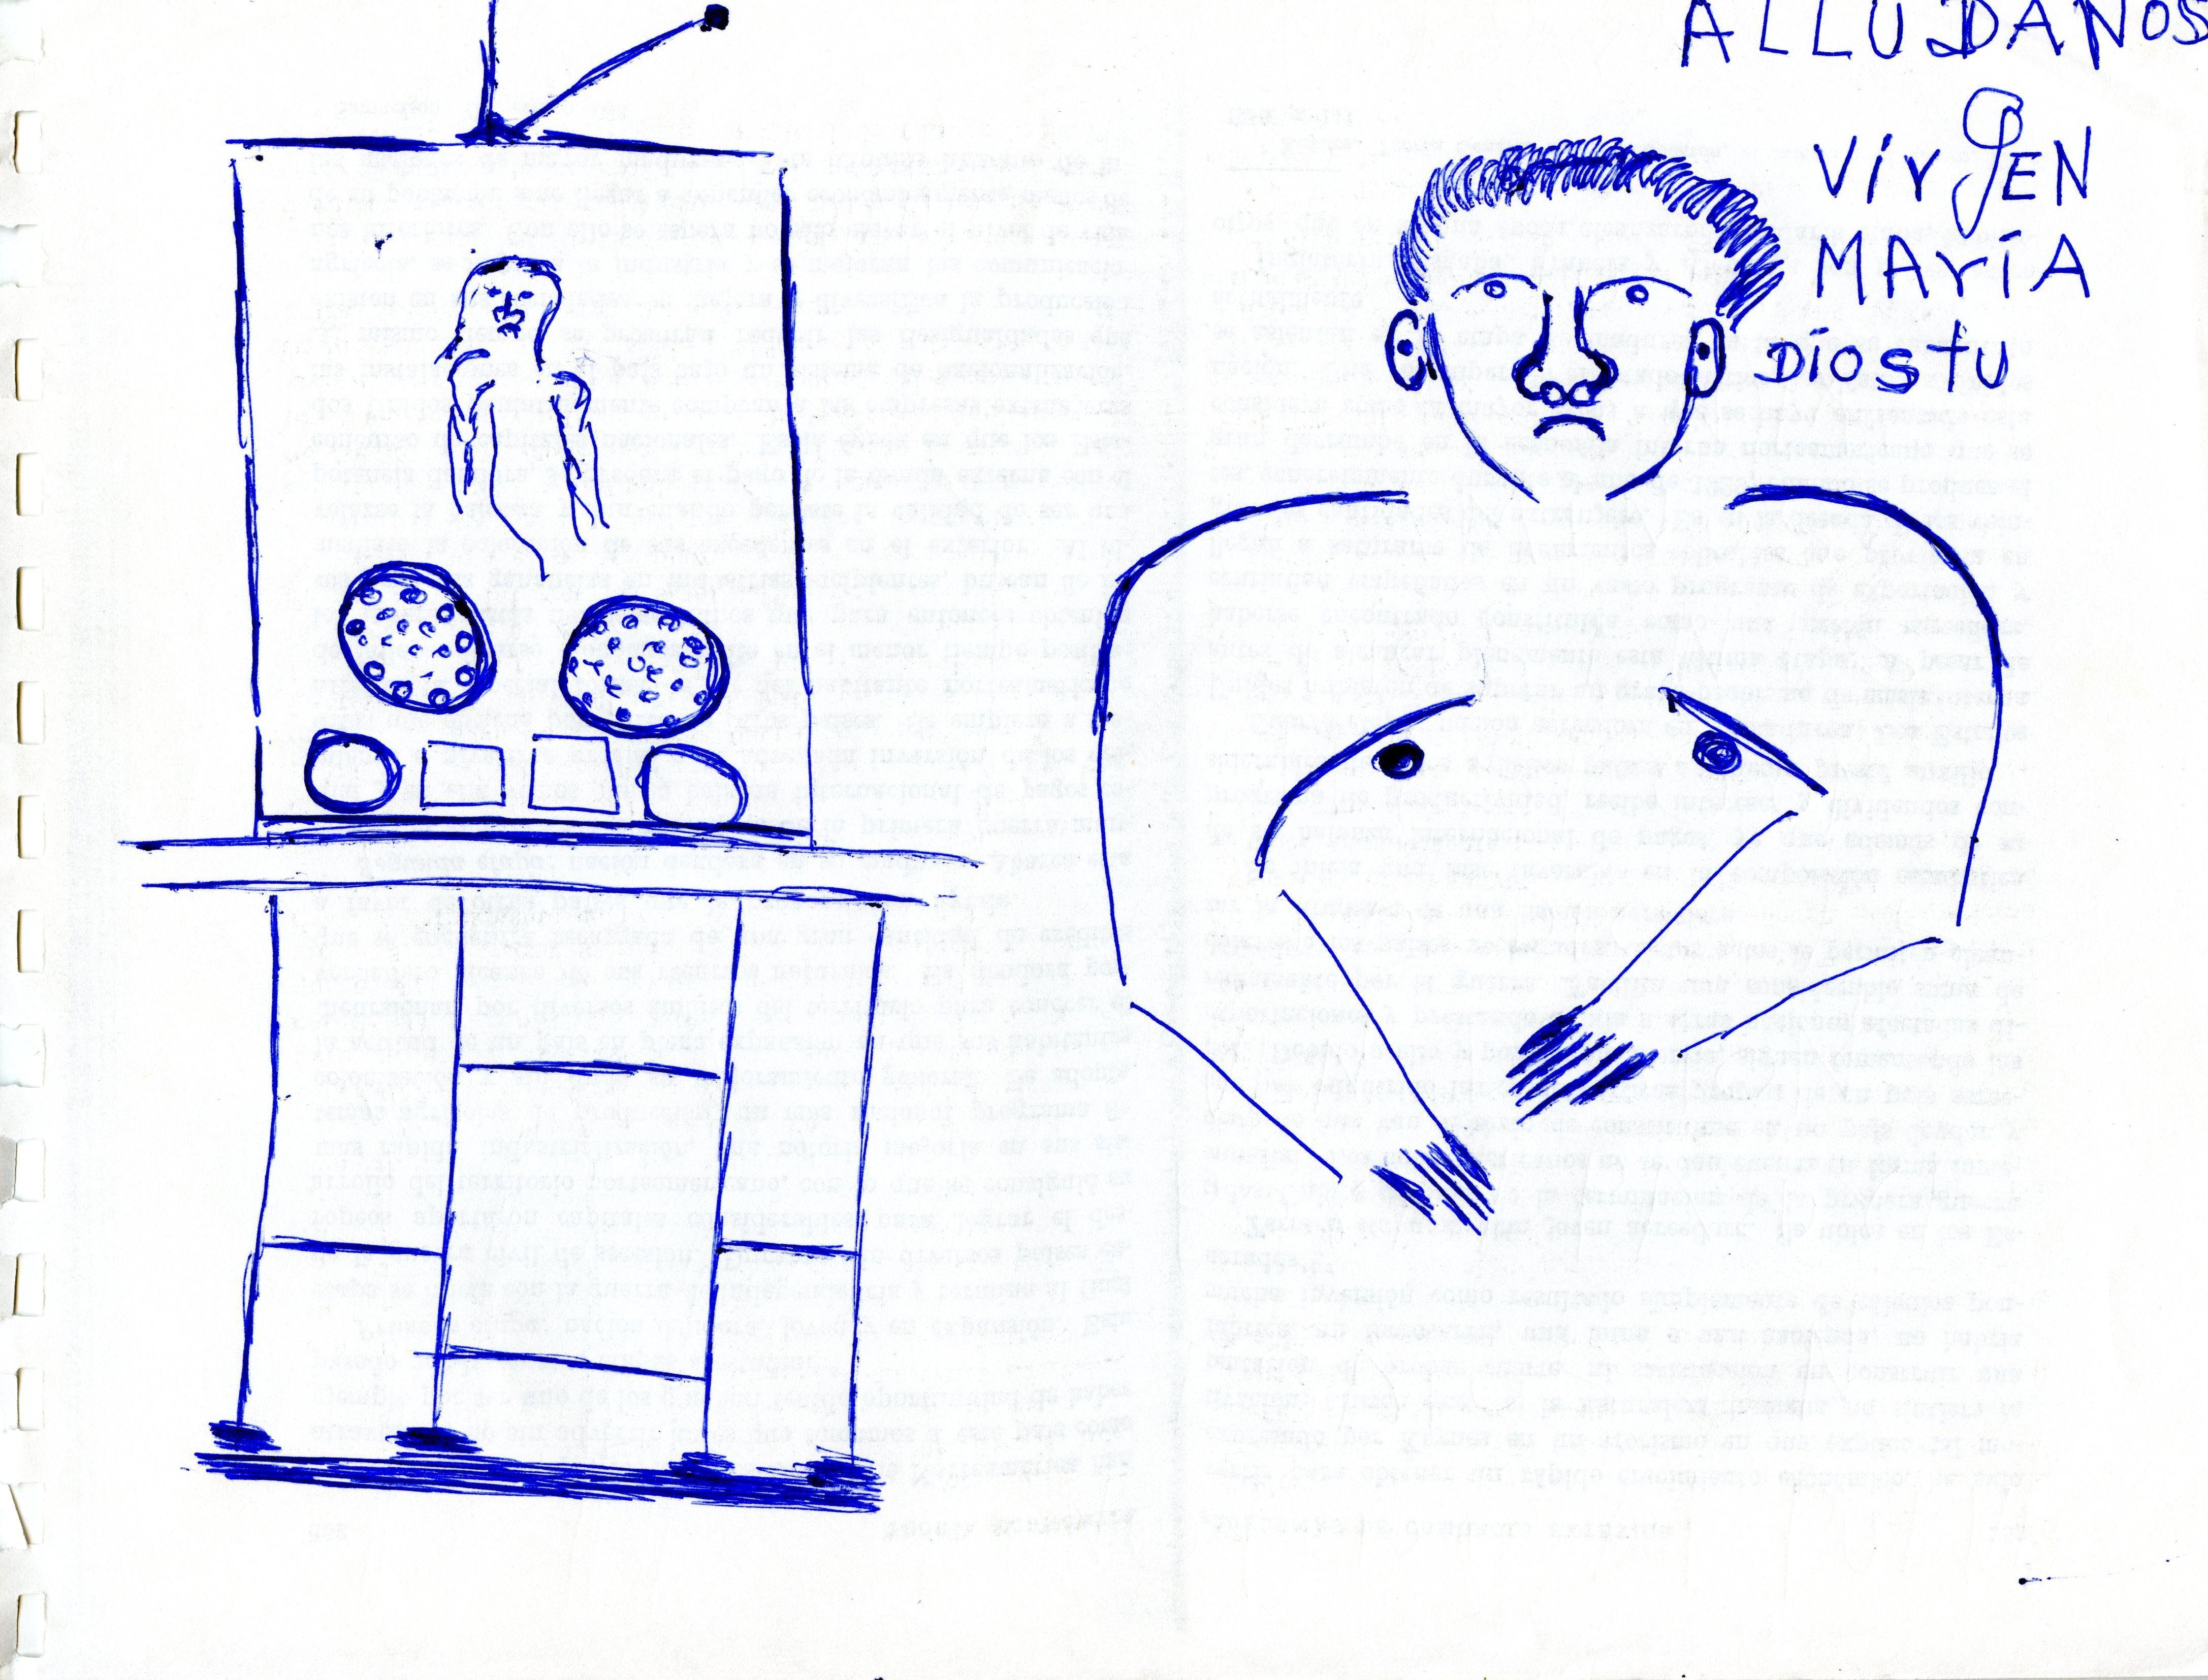 Arte carcelario: historias de sincronías